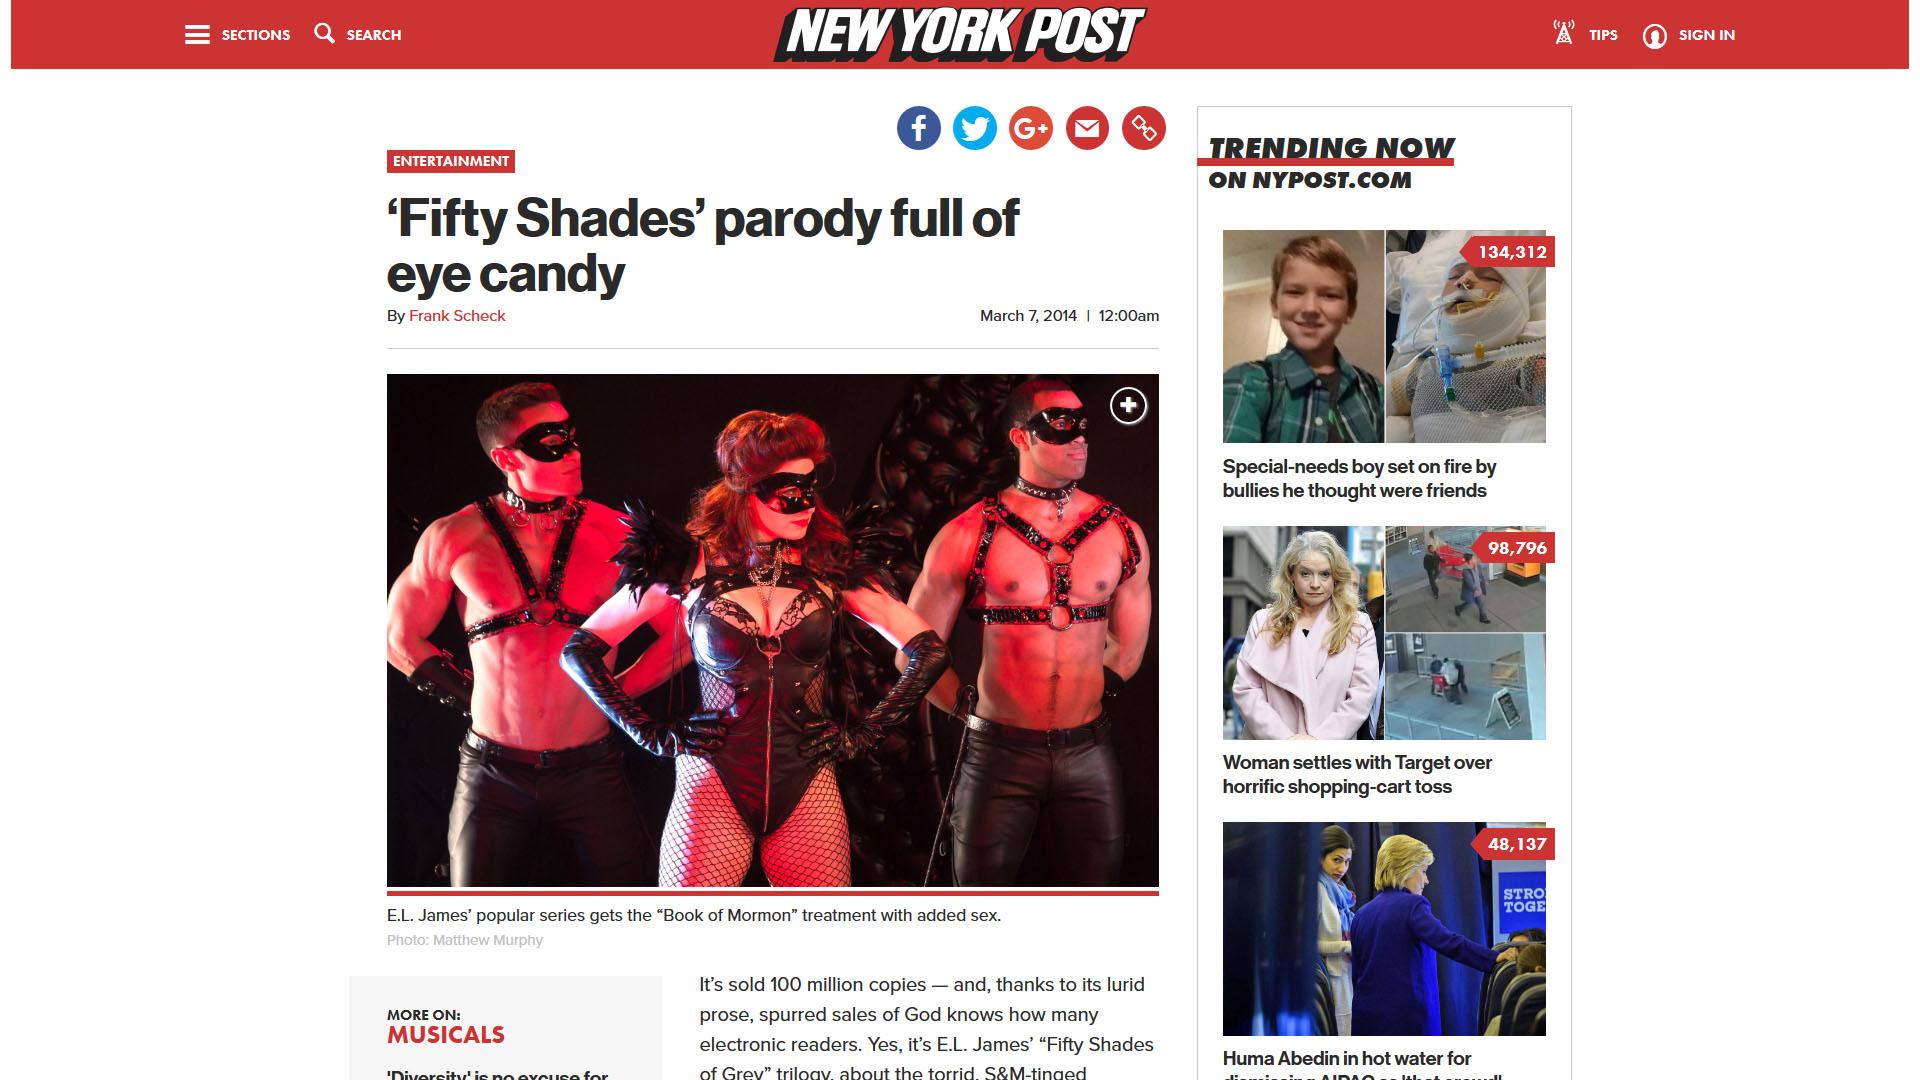 'Fifty Shades' parody full of eye candy